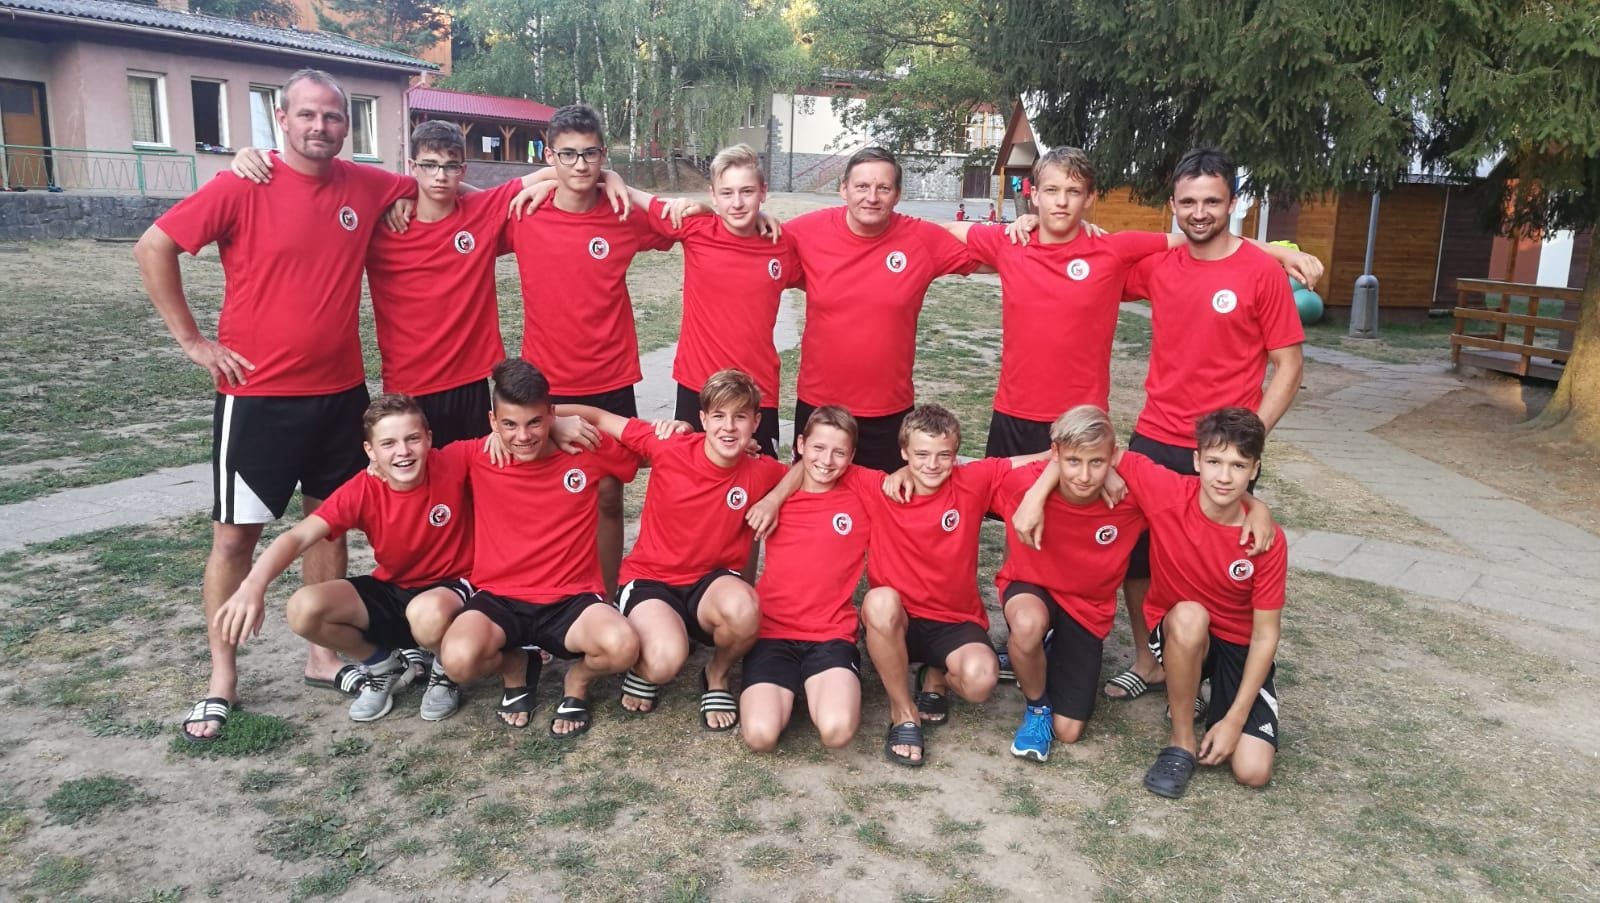 Mladší dorost SC Xaverov Horní Bradlo 2018